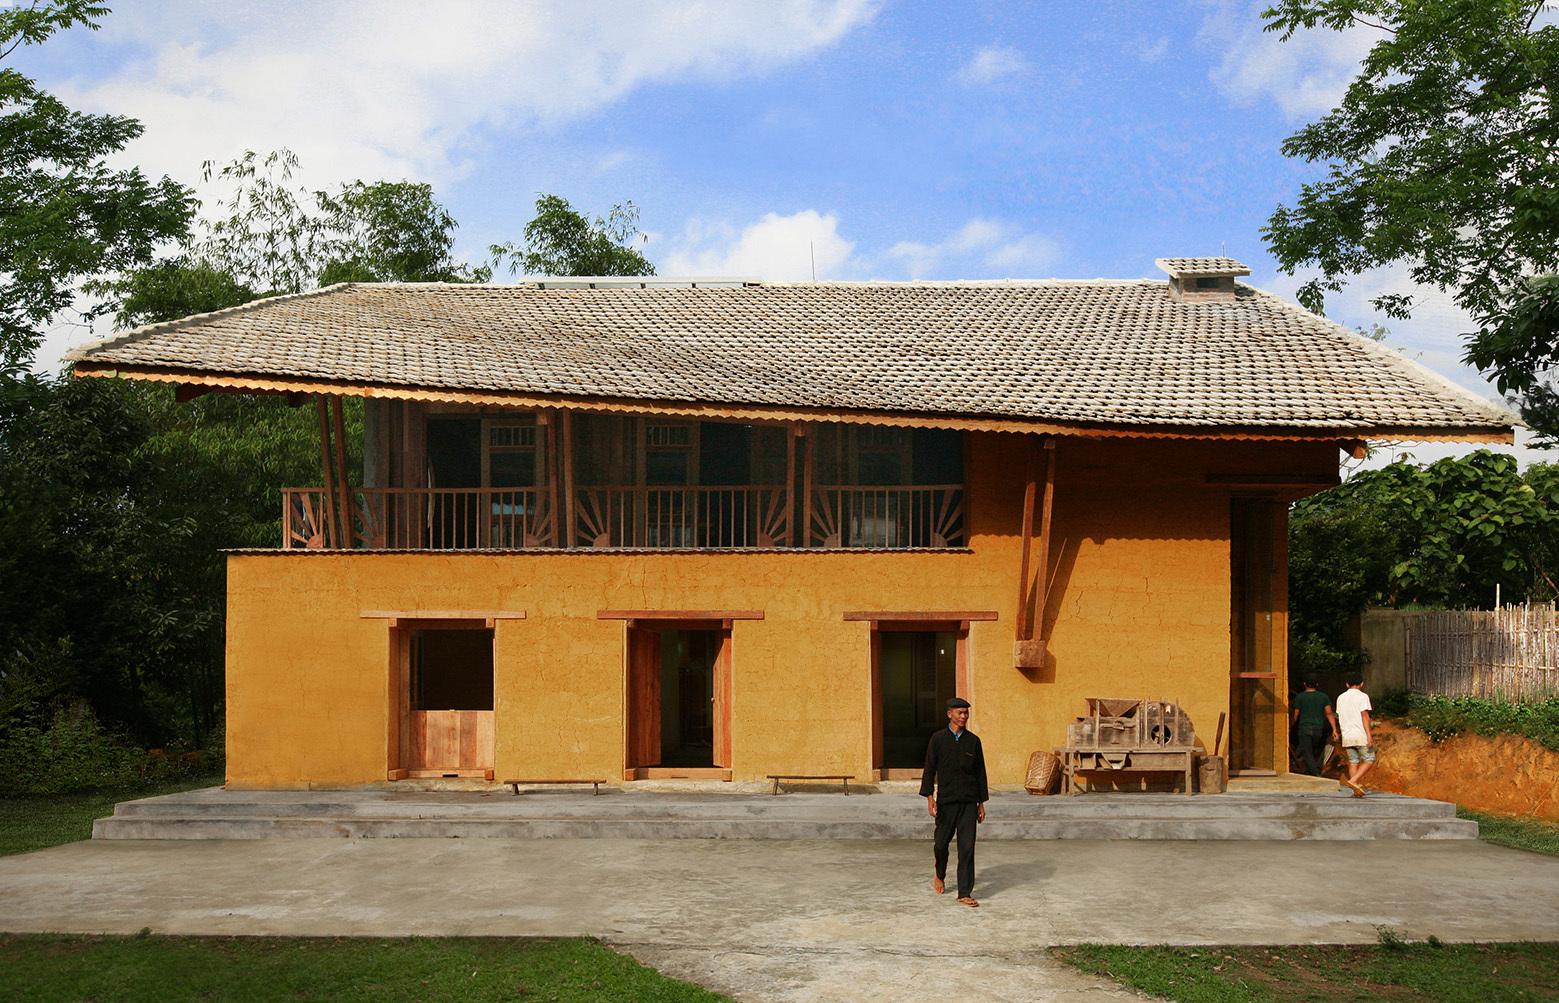 Nam Dam Homestay And Community House / 1+1>2 Architects